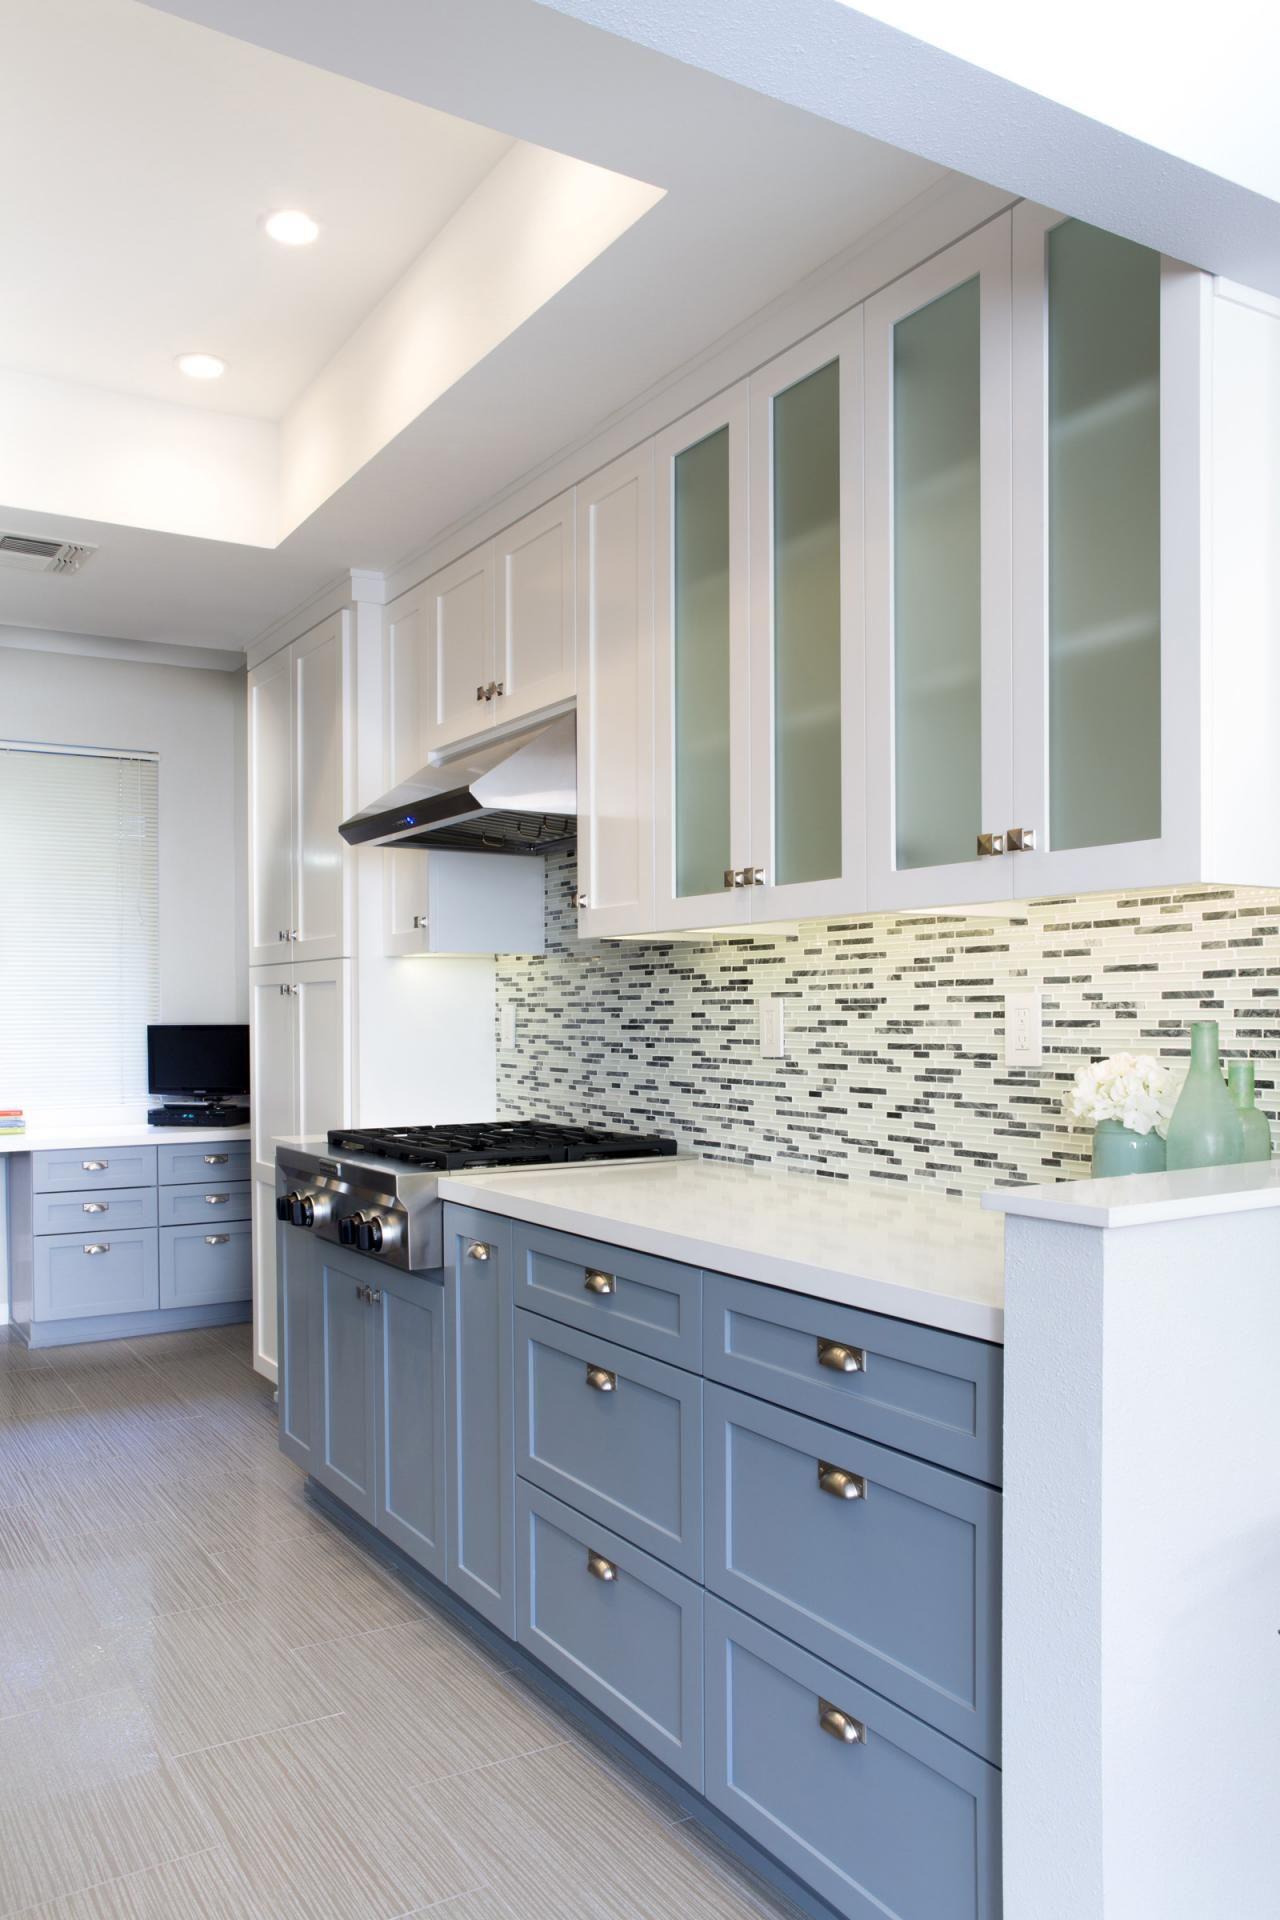 Cabinet Color Design Kitchen Cabinet Color Design Buslineus